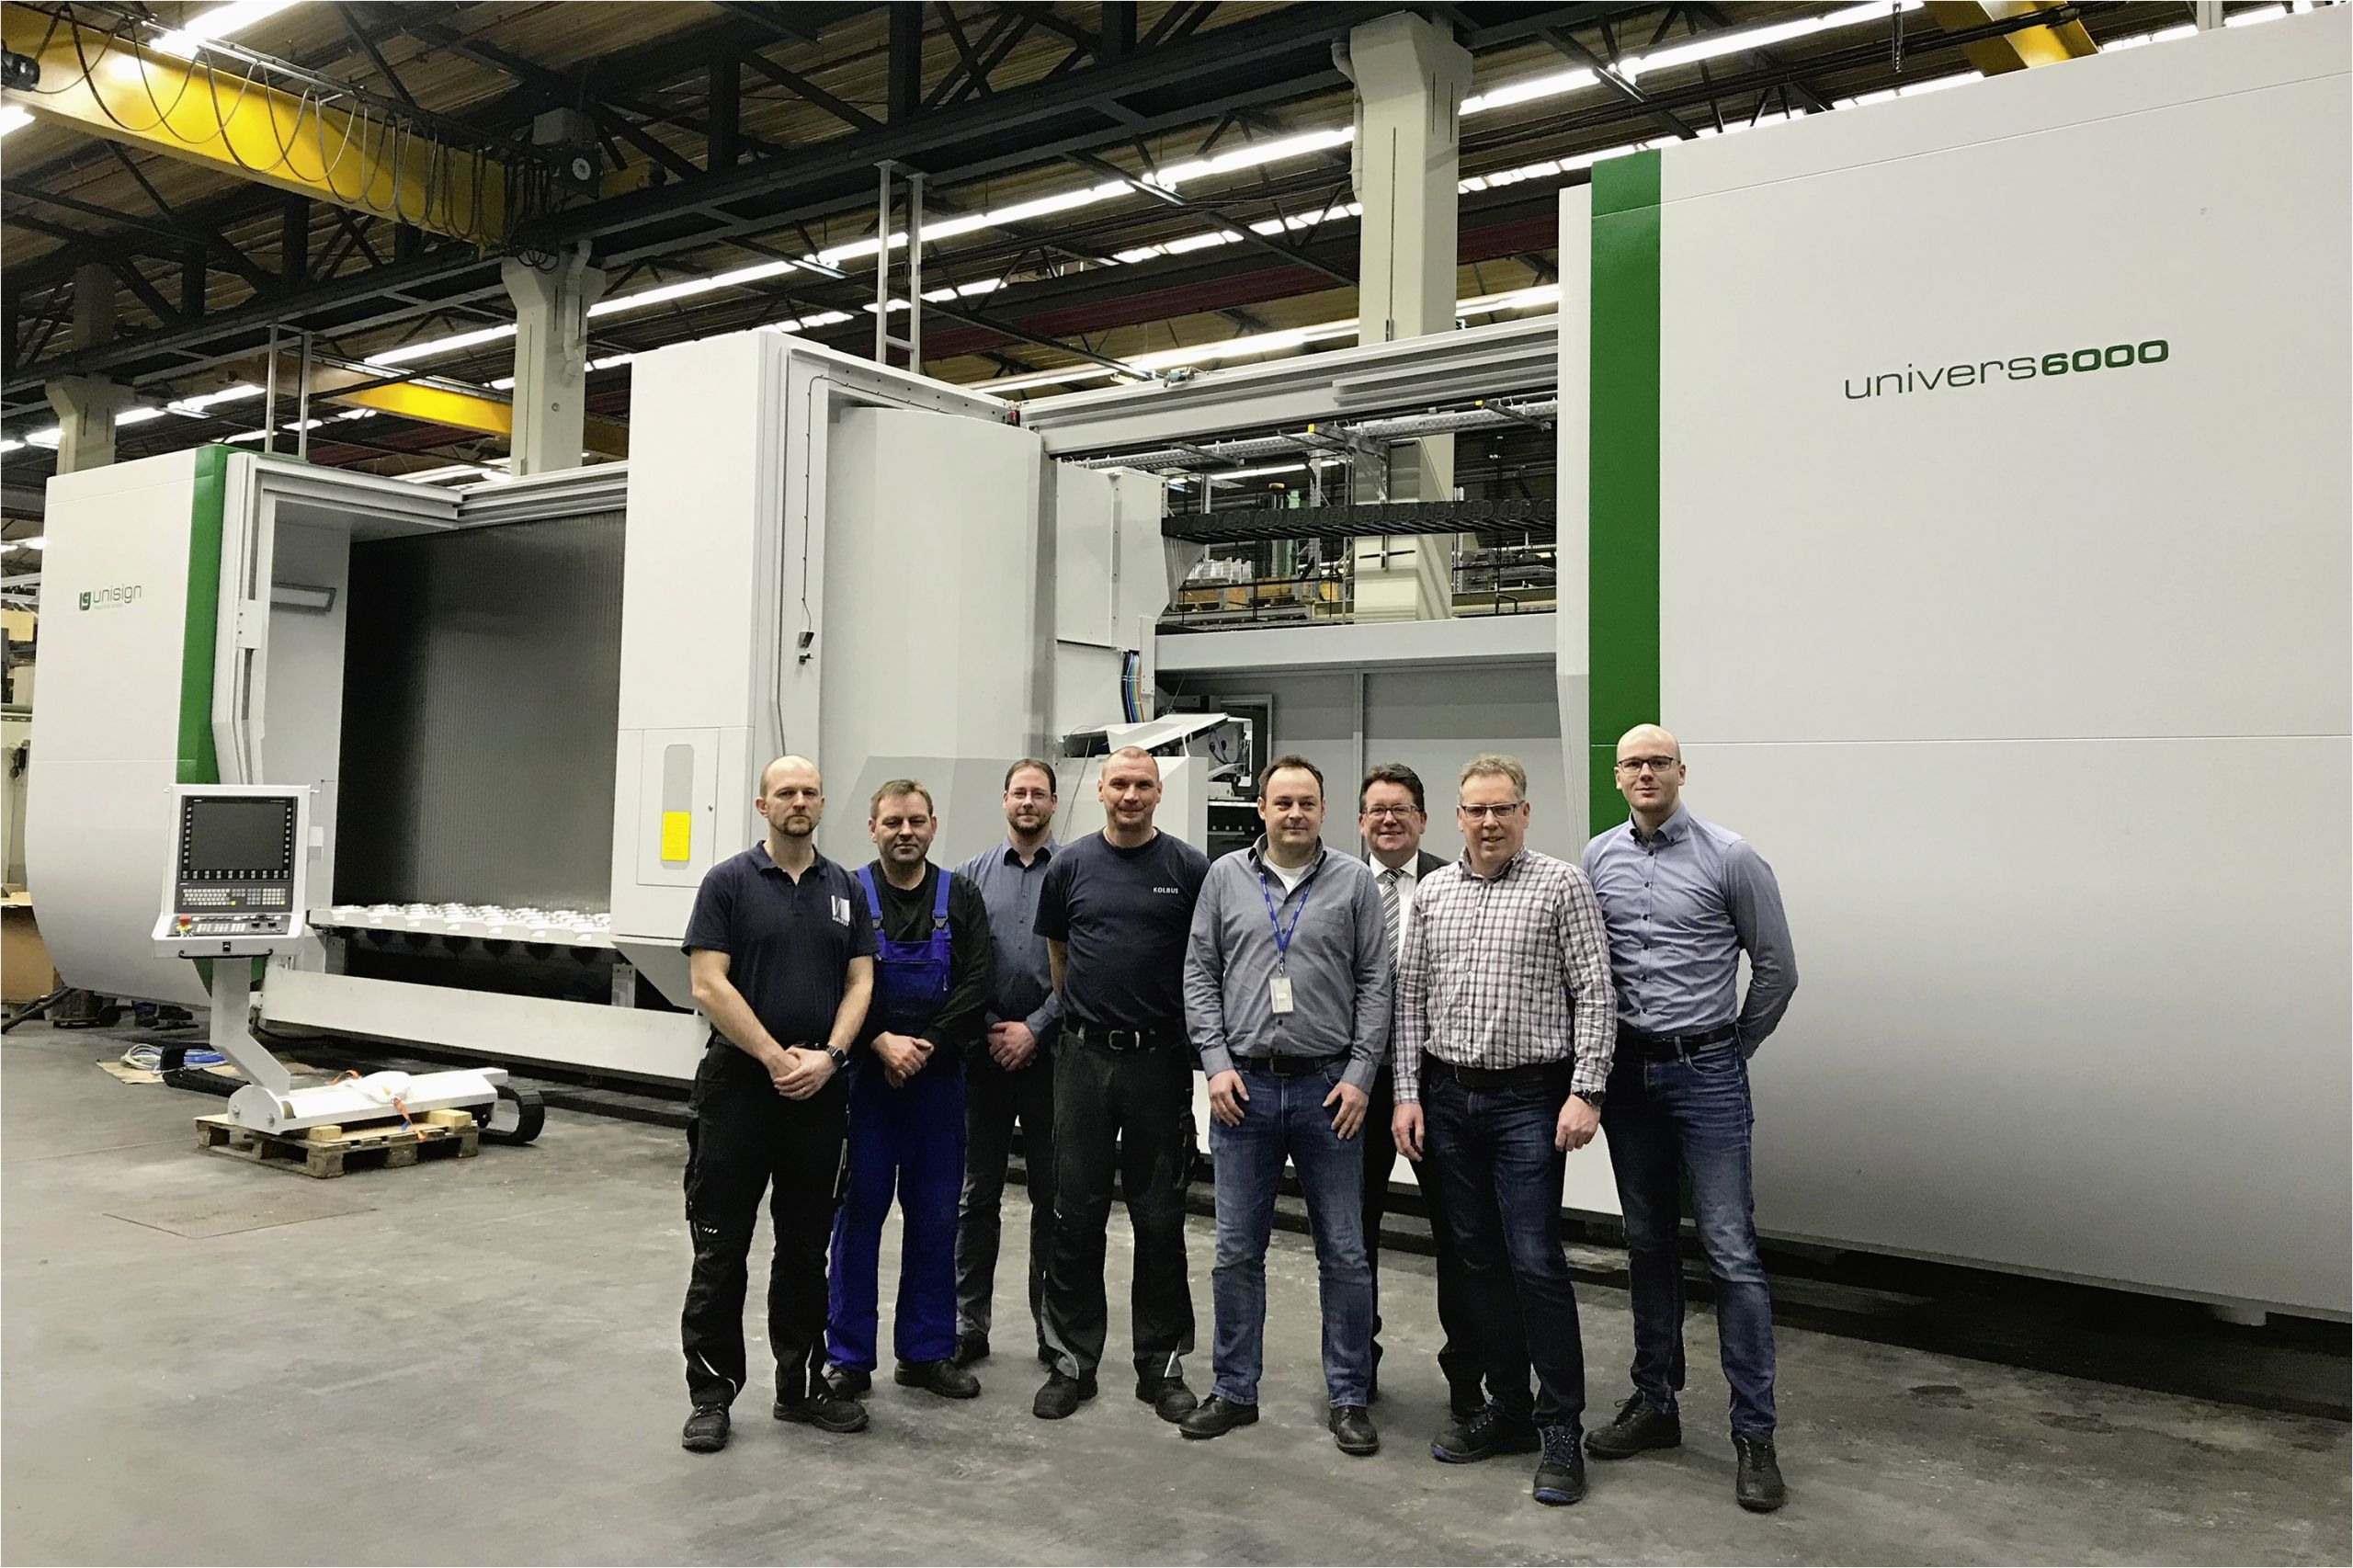 KOL Produktion Teilefertigung Team vor neuer Univers 6000 rgb